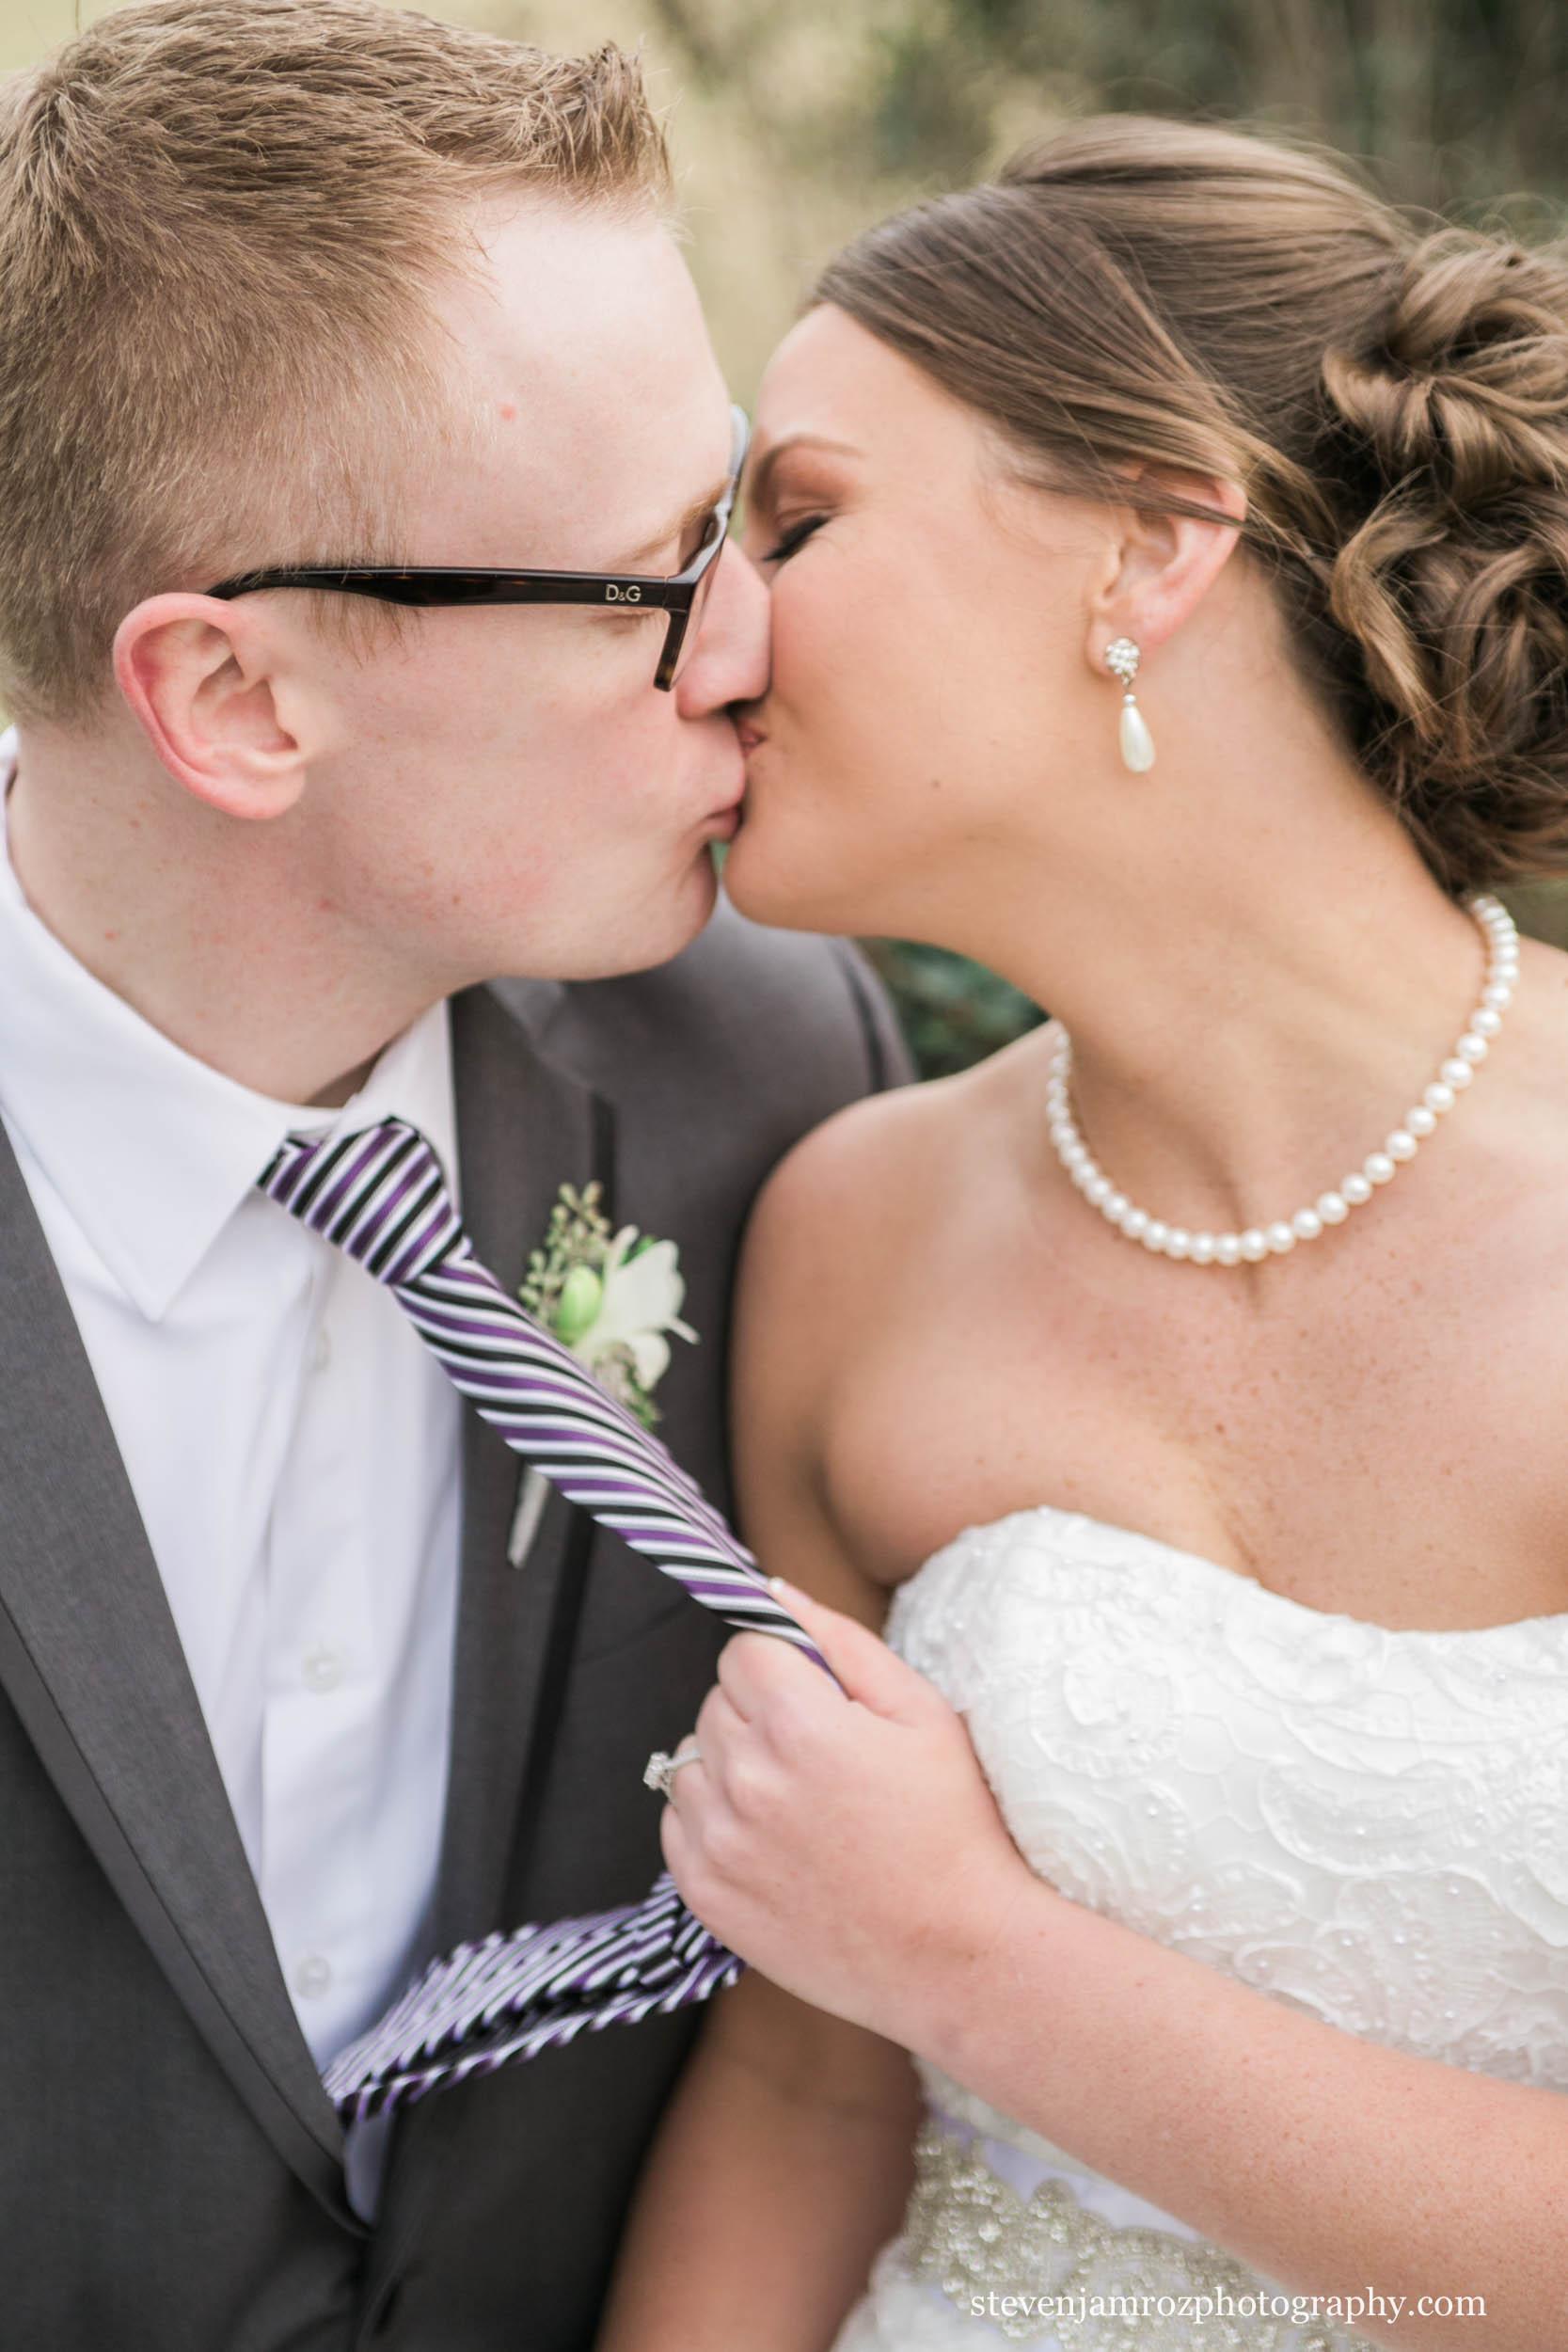 pulling-tie-bride-kiss-groom-wedding-steven-jamroz-photography-0177.jpg